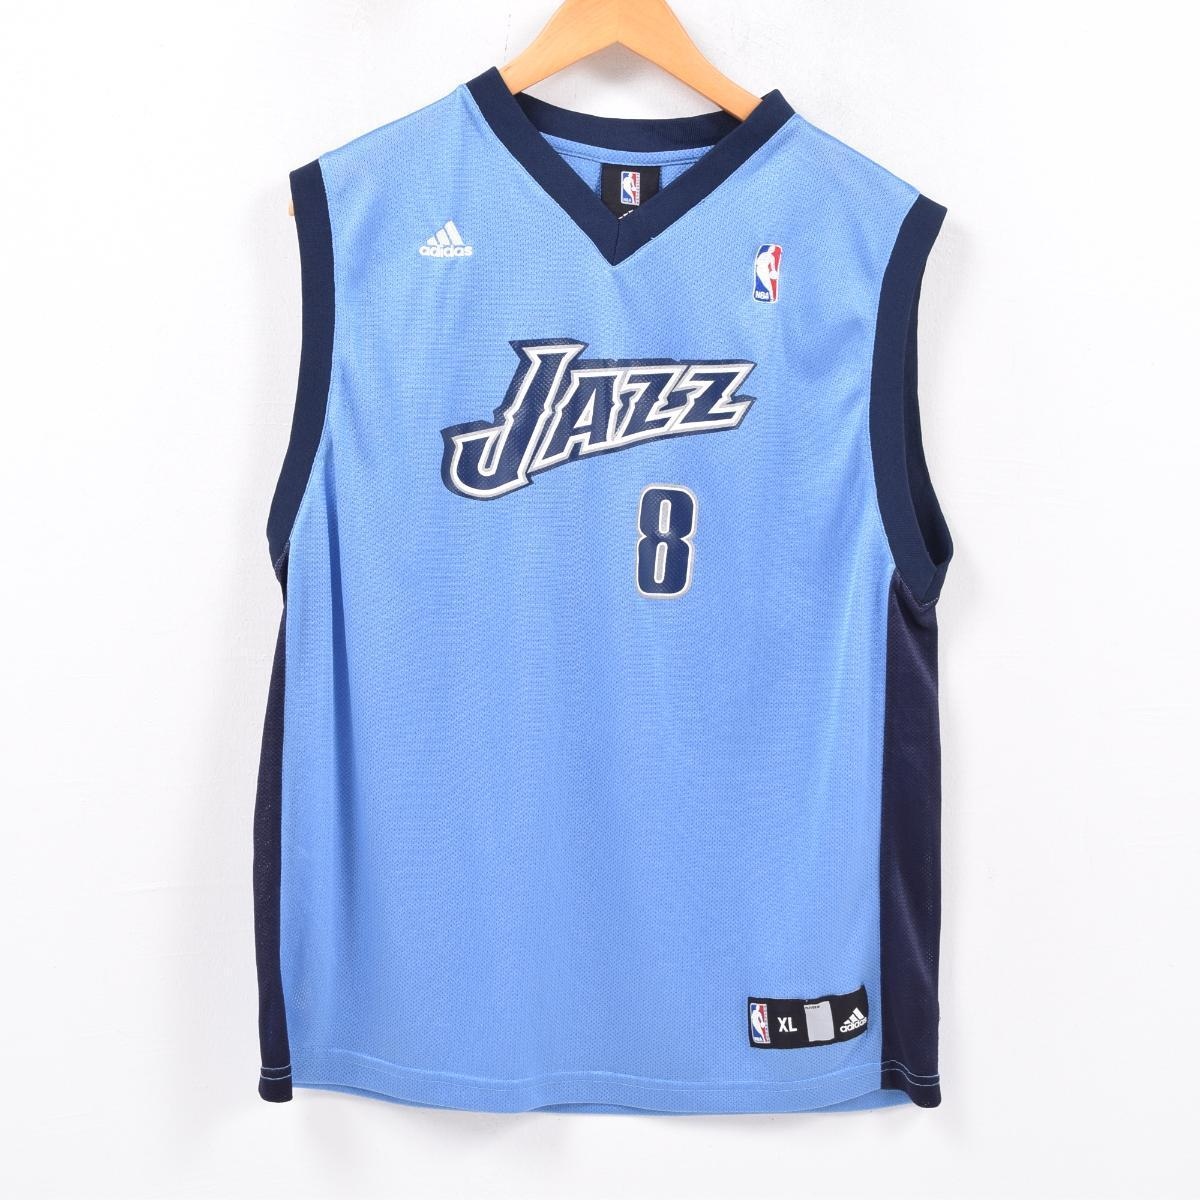 buy popular ee06b 3feec Adidas adidas NBA UTAH JAZZ ユタジャズデロンウィリアムス DERON WILLIAMS game shirt  replica uniform men L /wbd2644